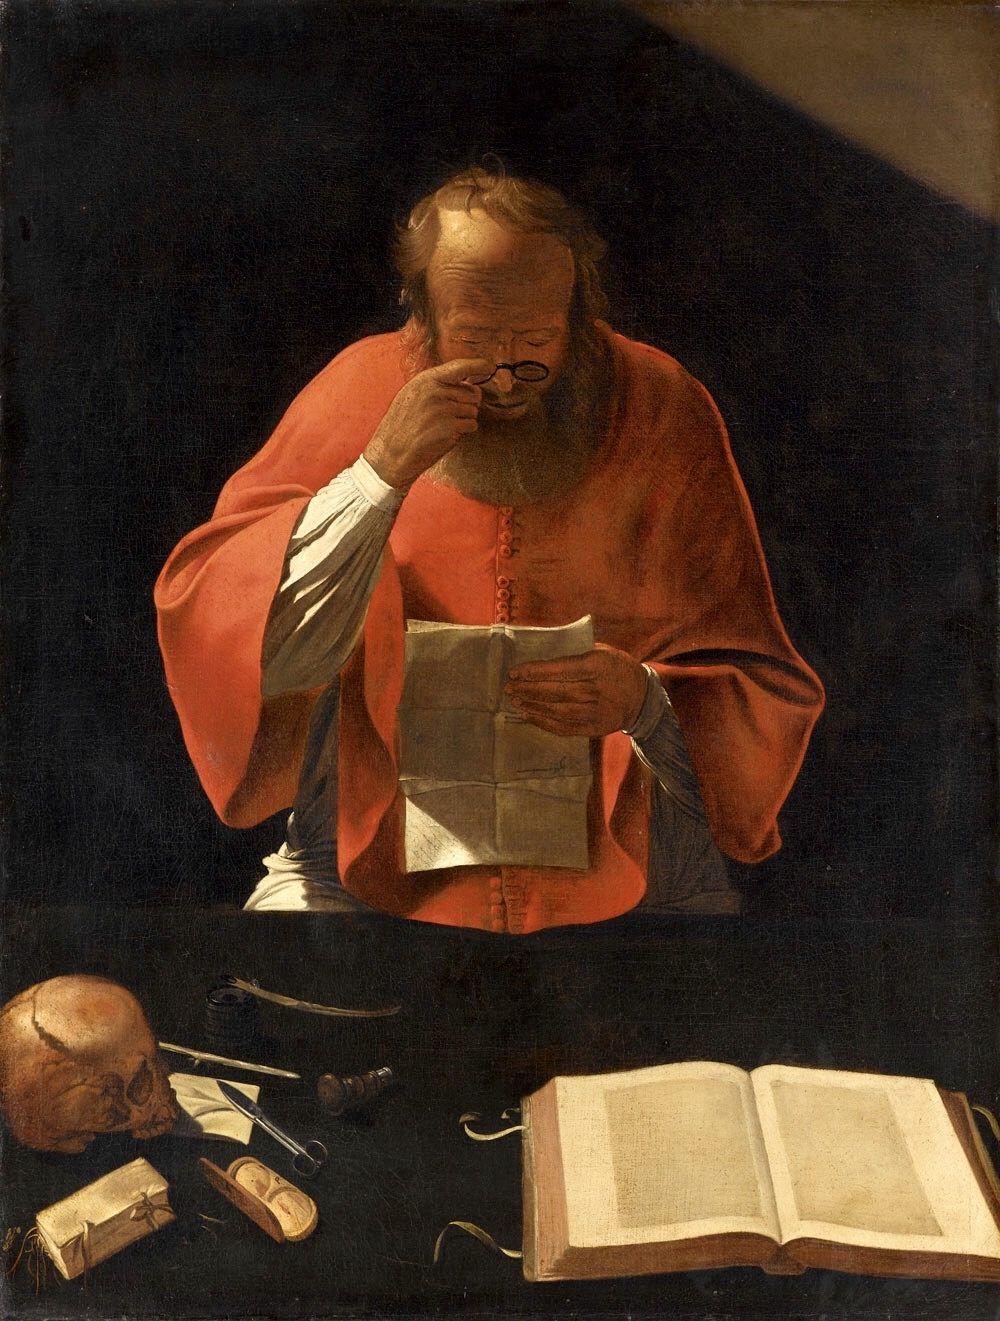 Картинки по запросу giclée-druck: la tour's saint jerome reading (cop), ca 1636, 61x46cm.